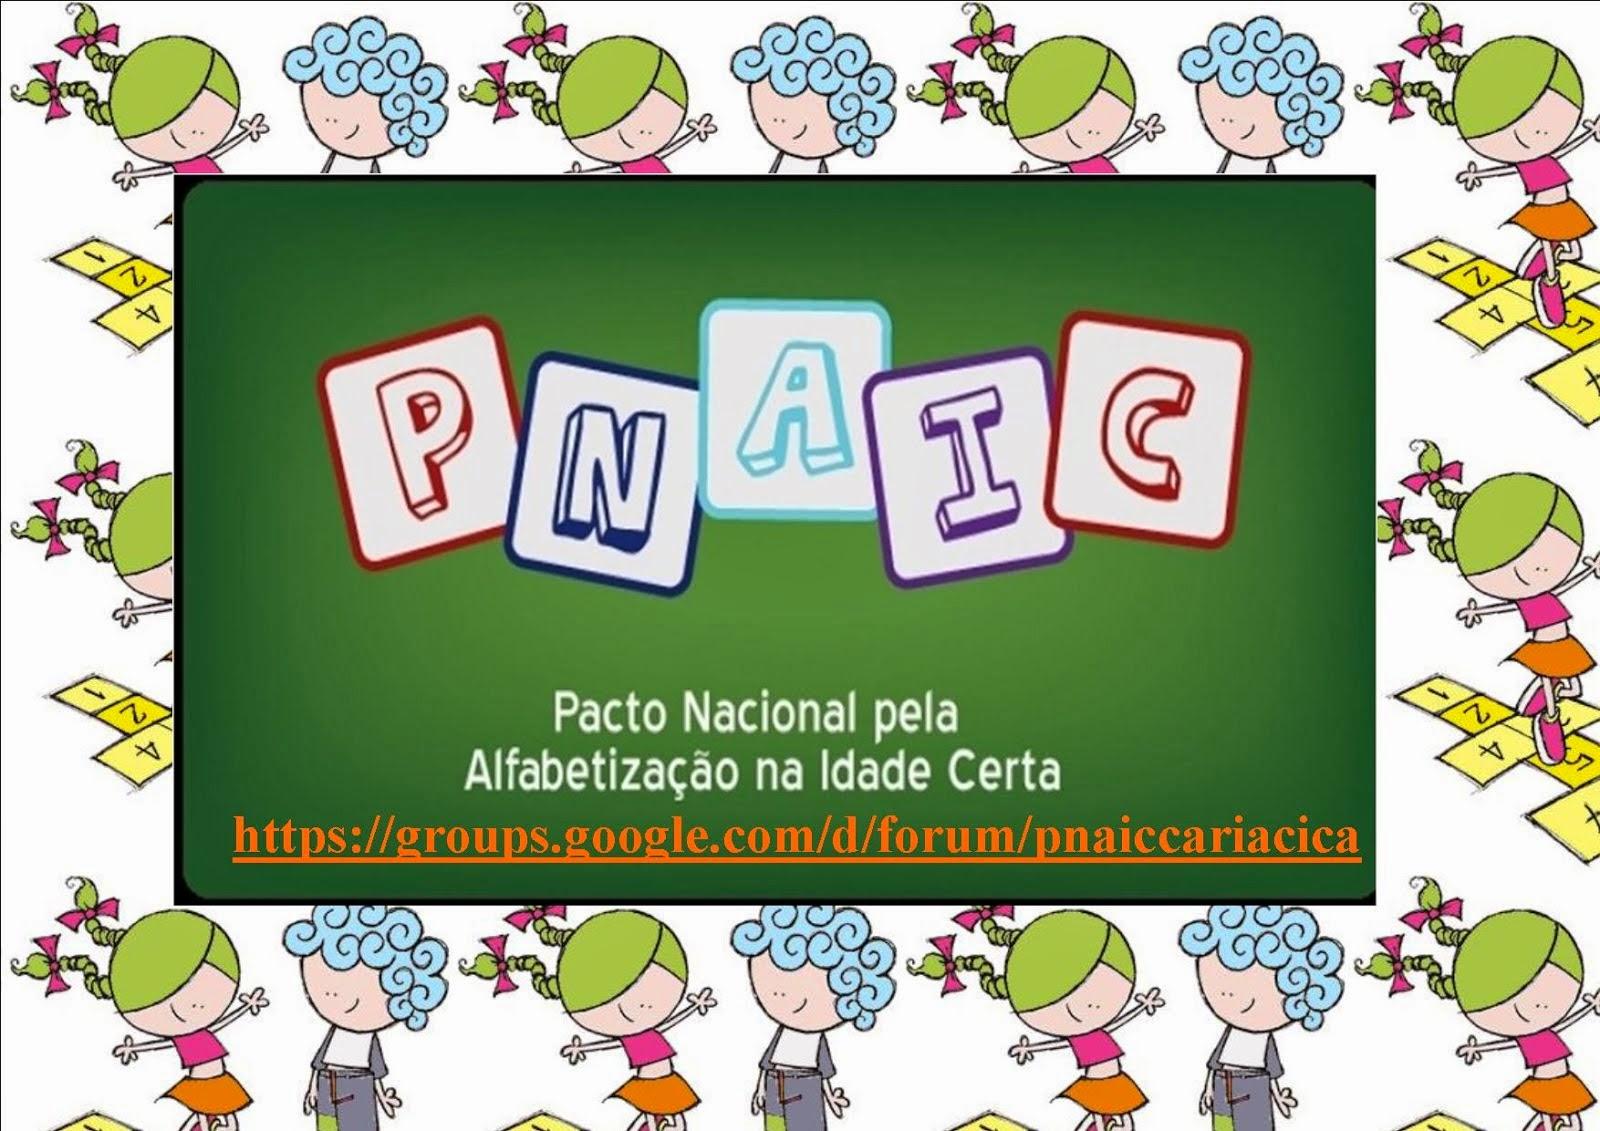 Pnaic - Cariacica - ES